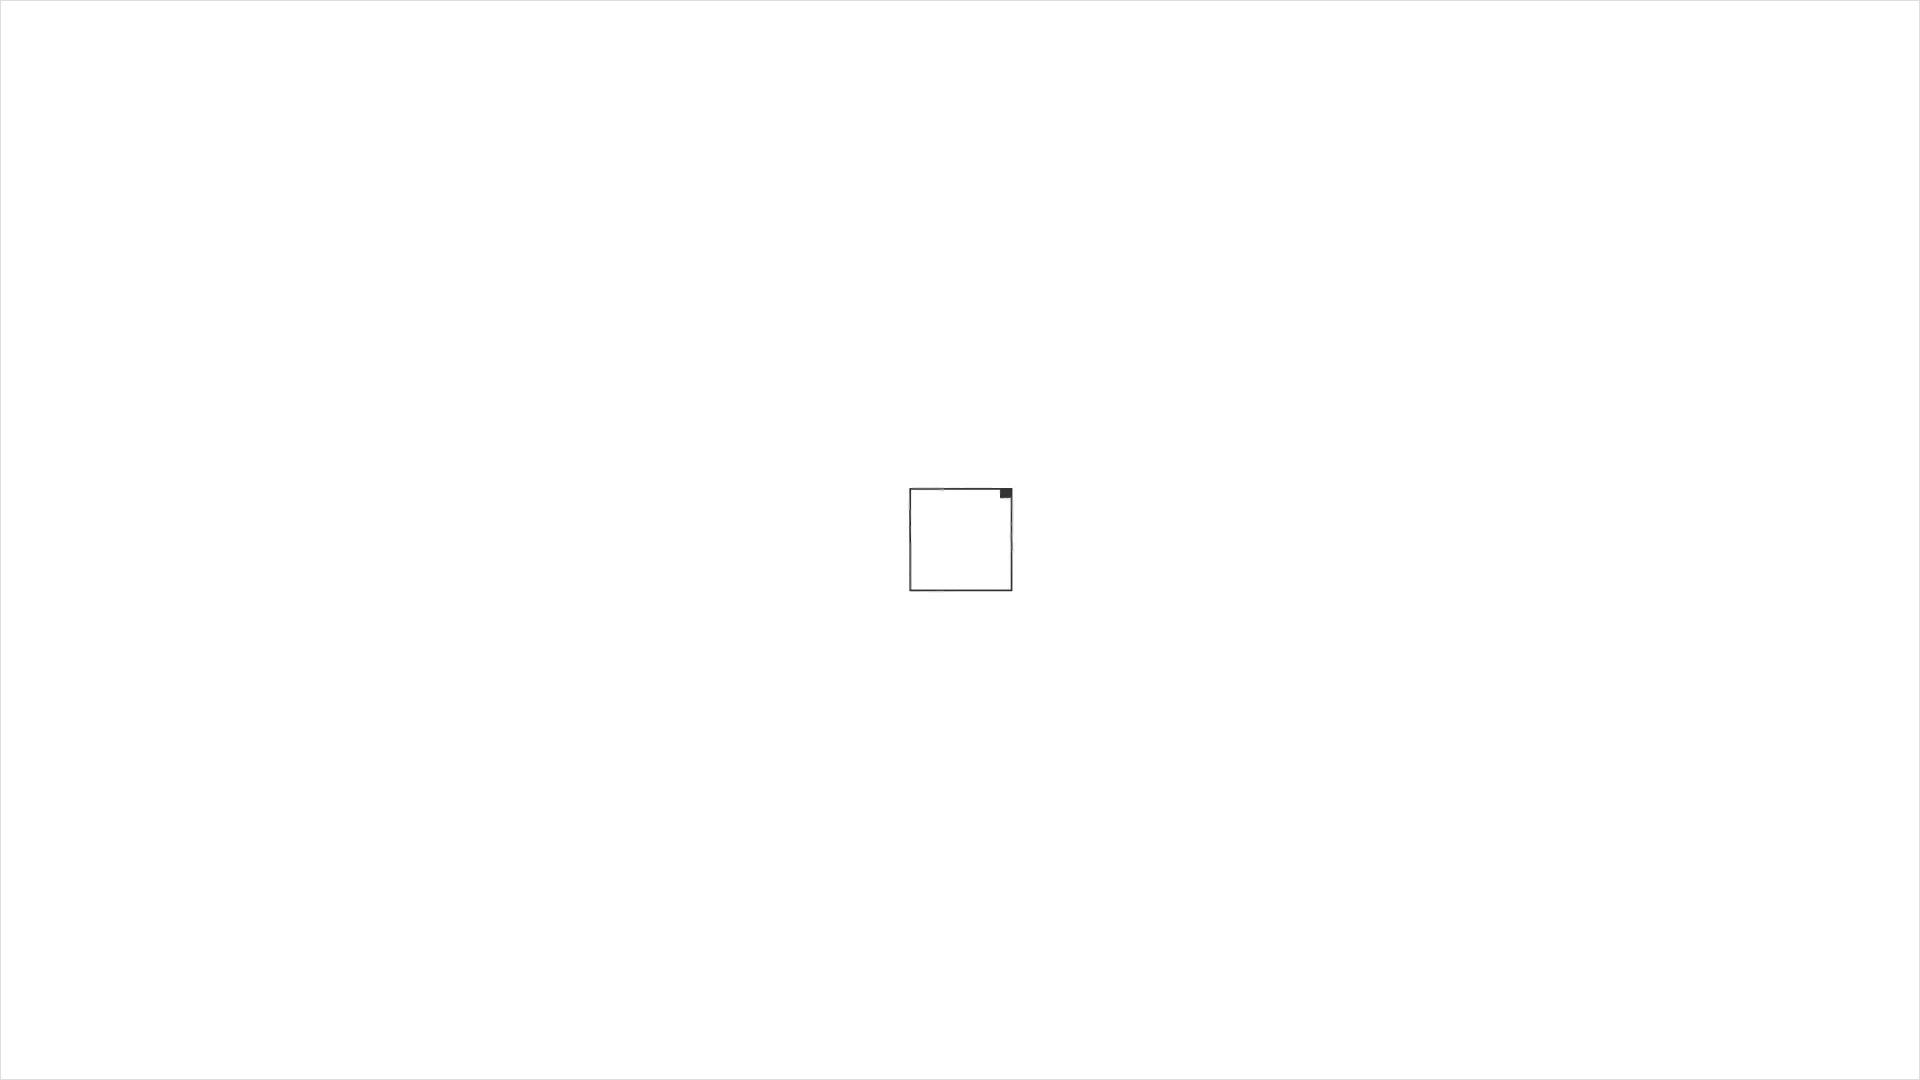 logo opener - video - víctor merino _ video marketing online